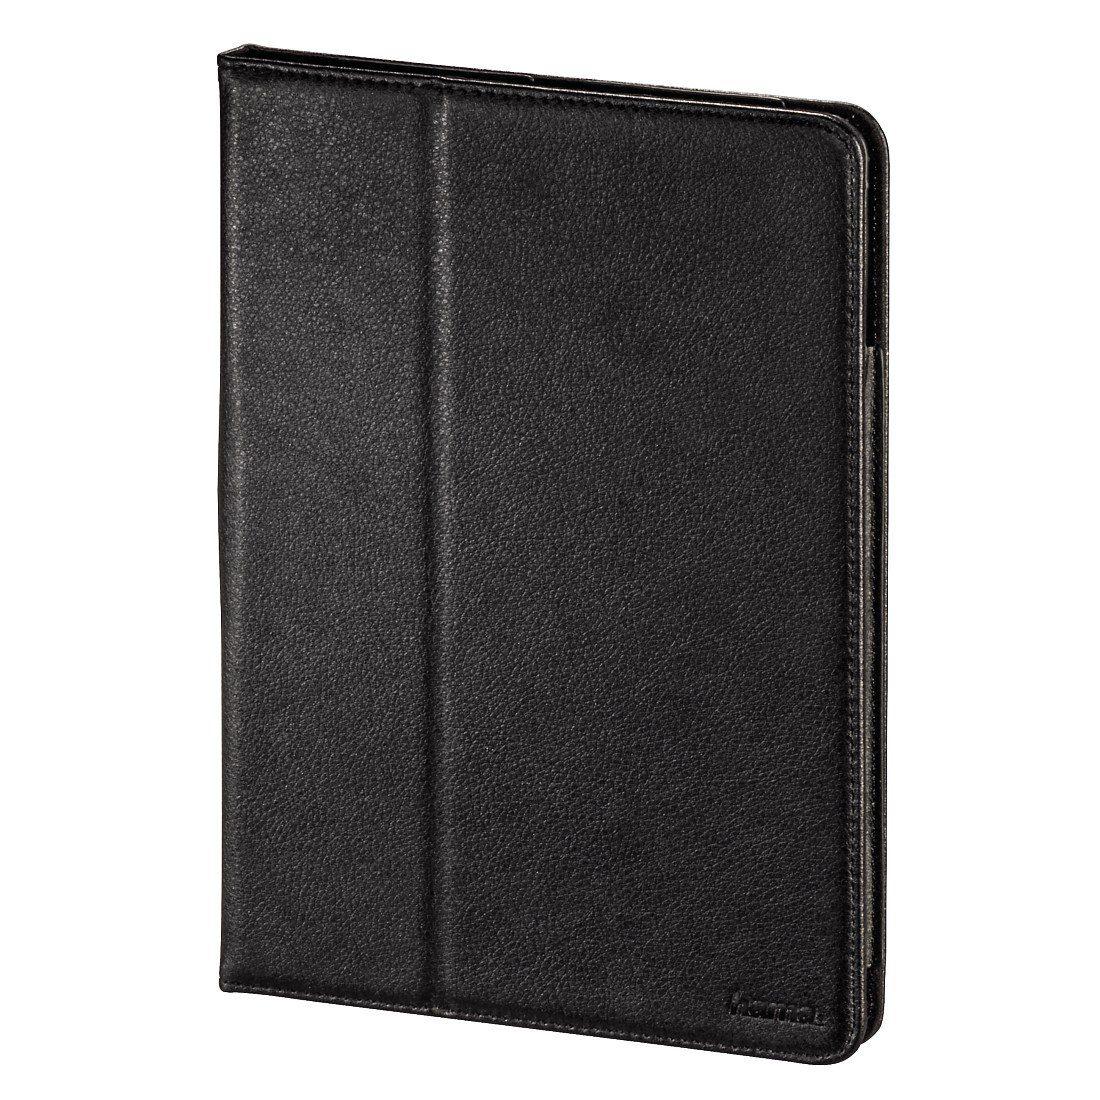 Hama Portfolio Bend für Galaxy Tab S2 9.7, Schwarz